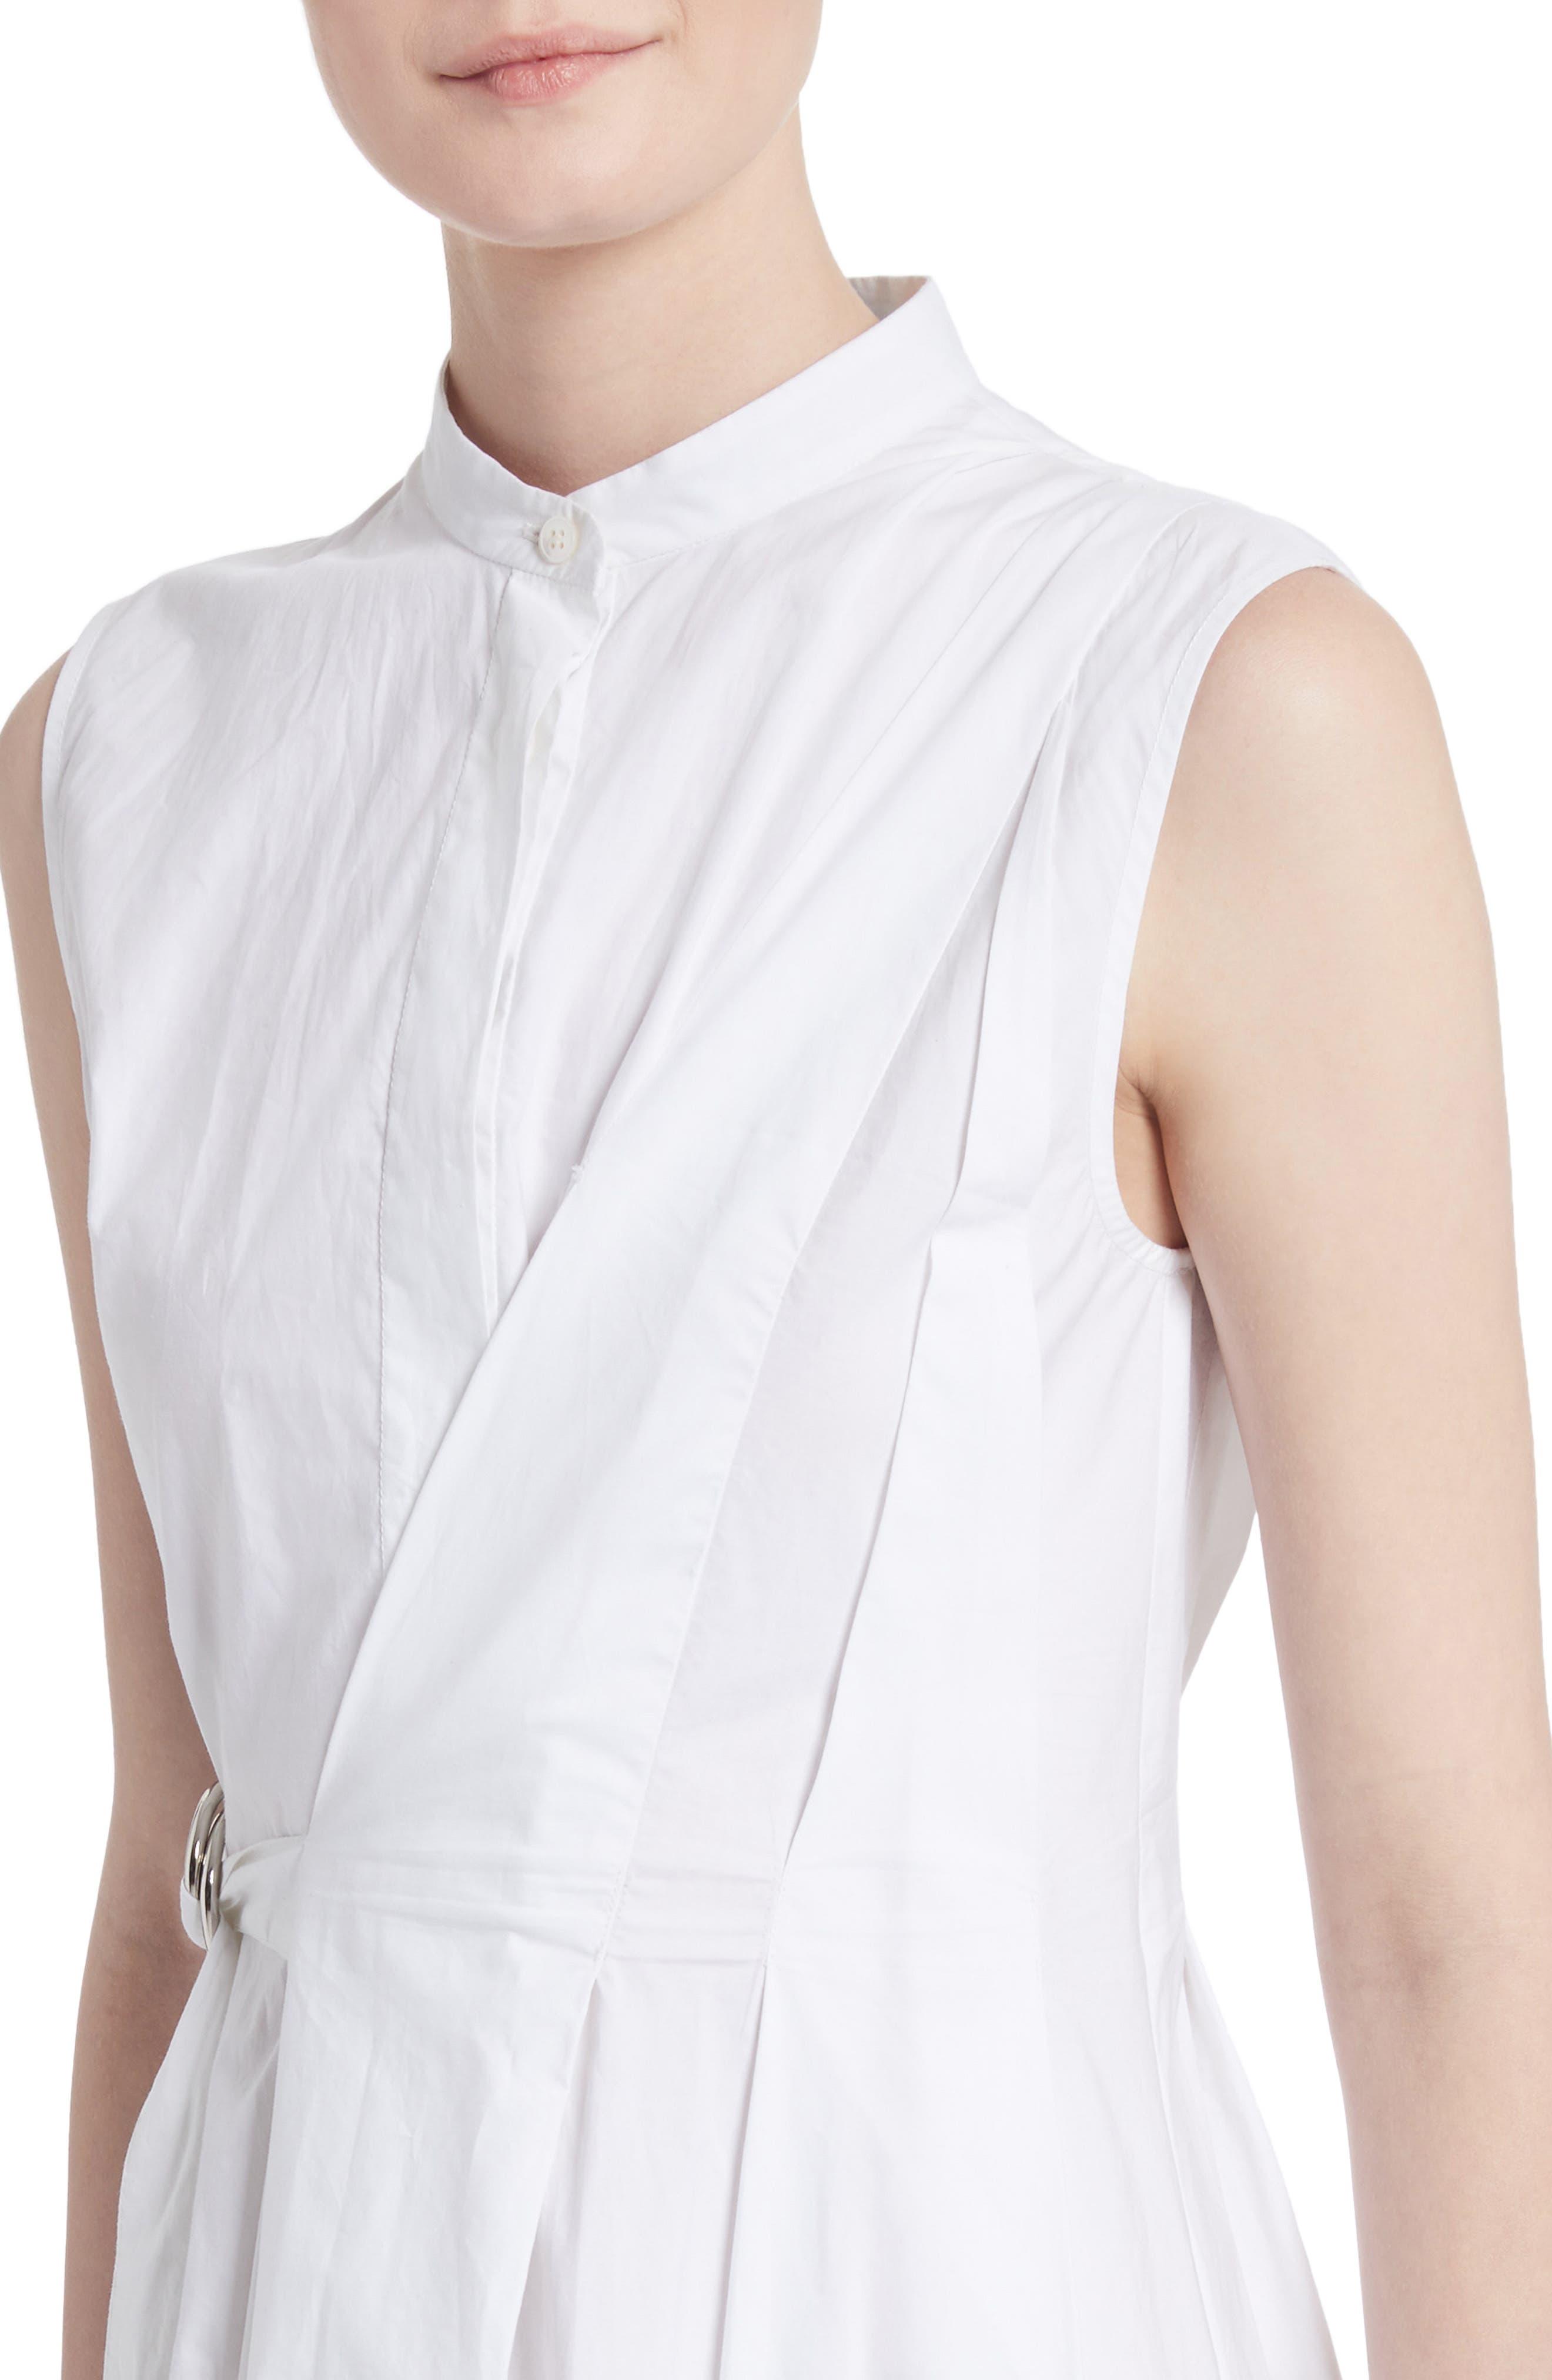 PROENZA SCHOULER,                             Cotton Poplin Wrap Dress,                             Alternate thumbnail 4, color,                             100